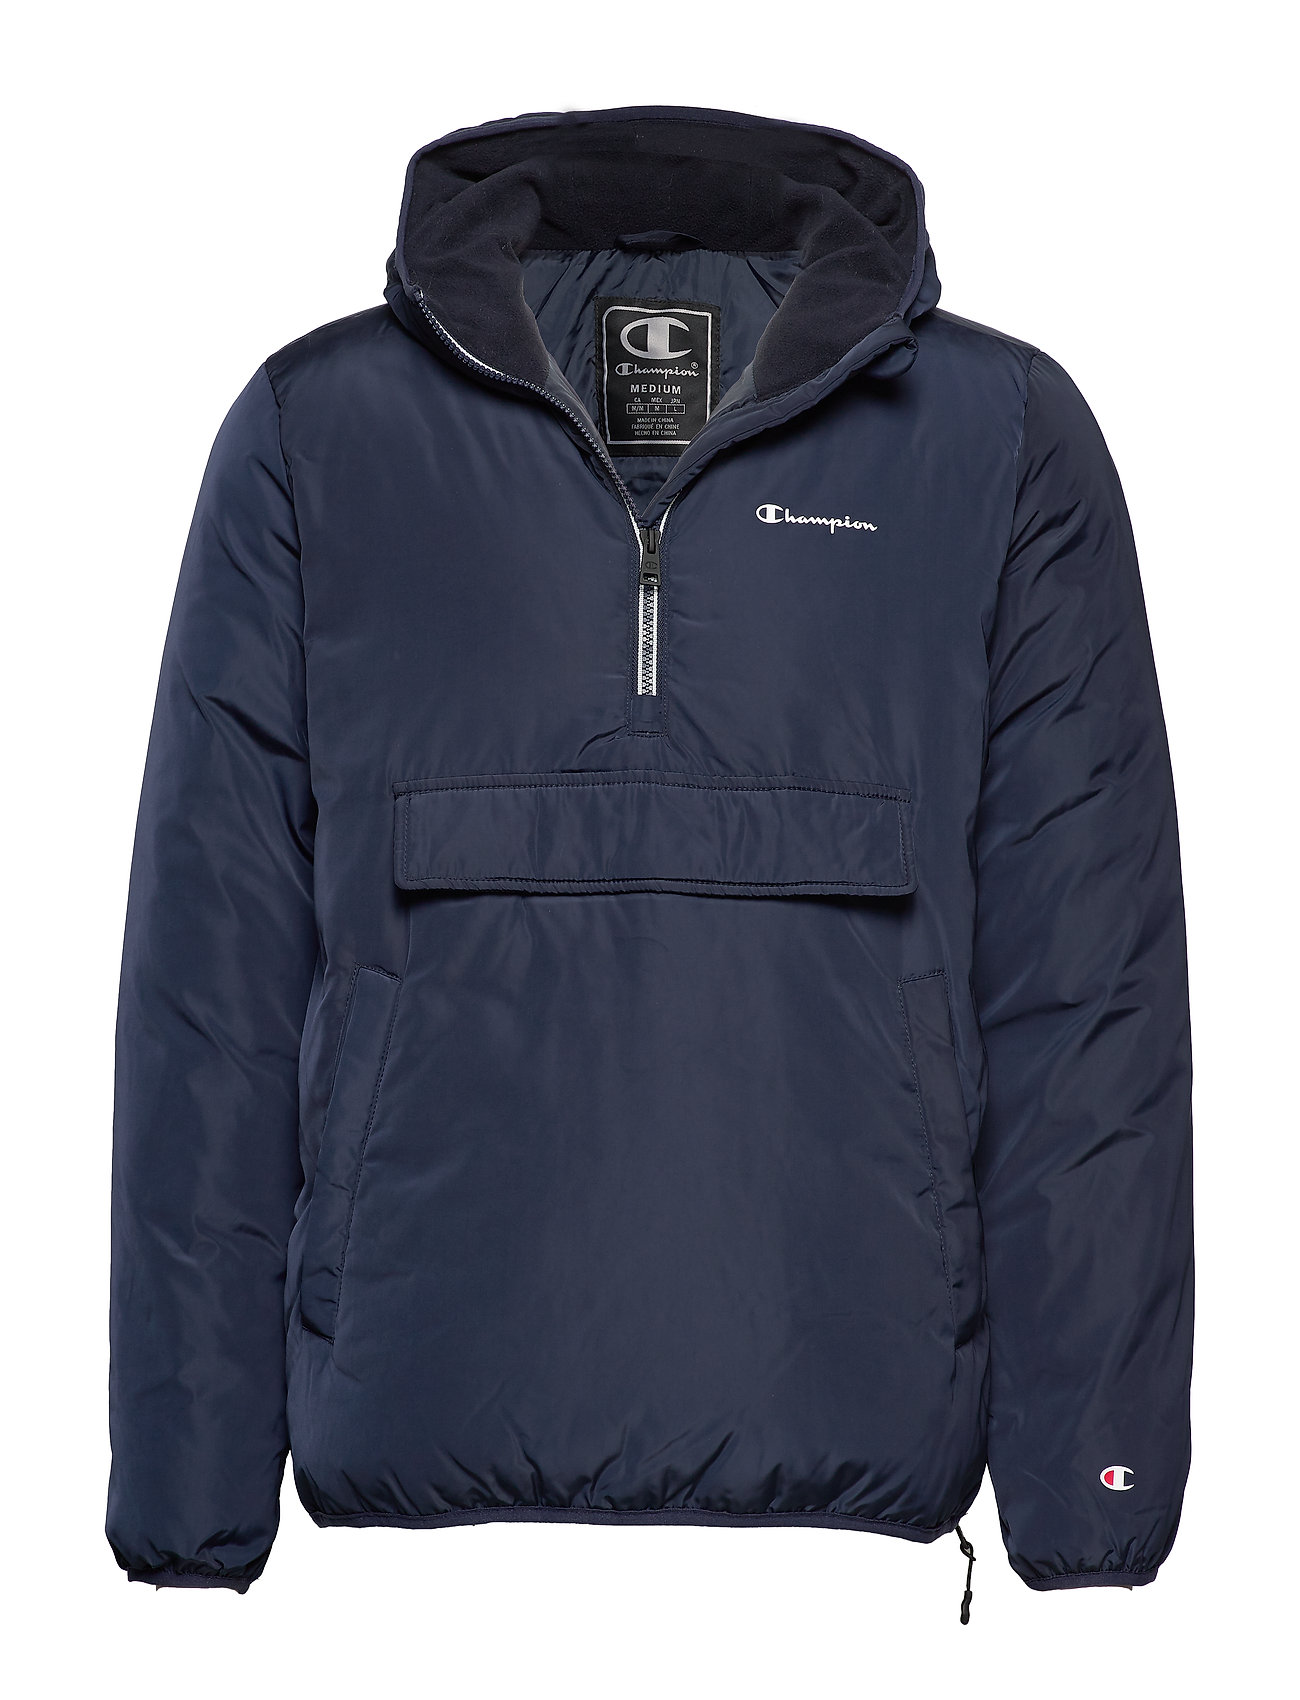 CHAMPION Hooded Jacket Outerwear Jackets Anoraks Blau CHAMPION